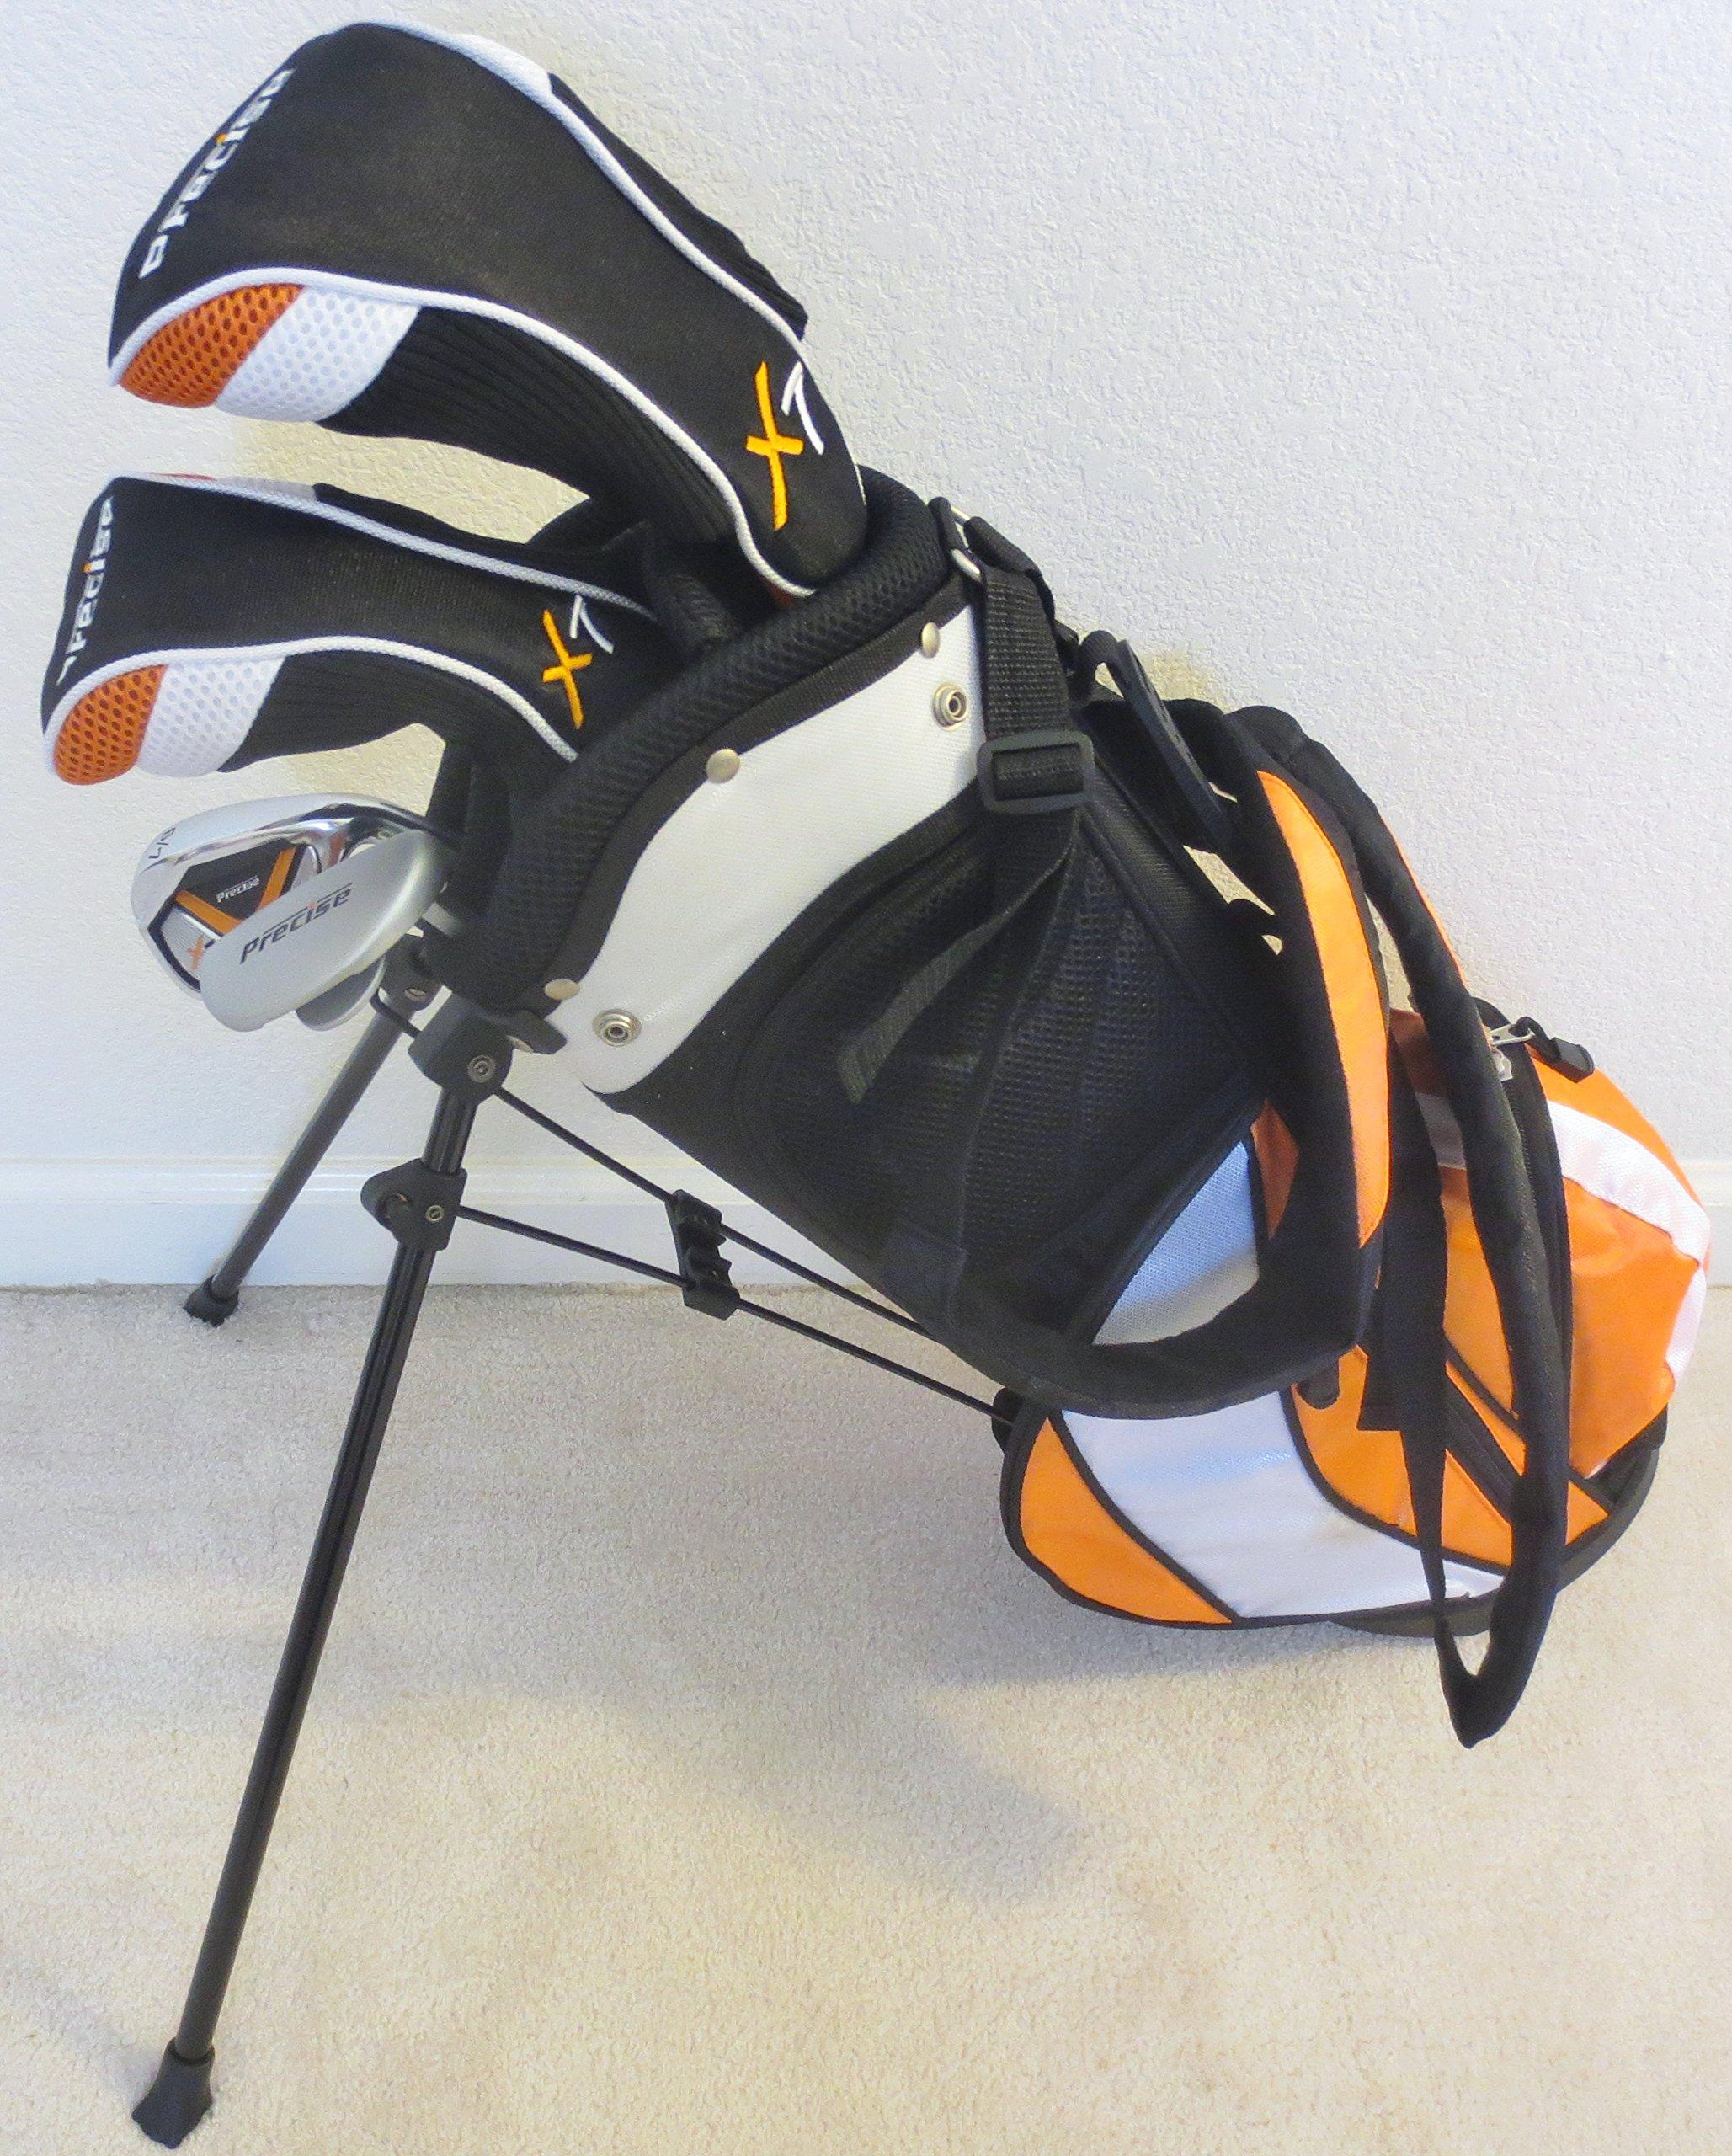 Jr. Kids Golf Club Set with Stand Bag for Children Ages 3-6 Cool Orange Color Premium Junior Professional Quality by Junior Golf Professional (Image #1)